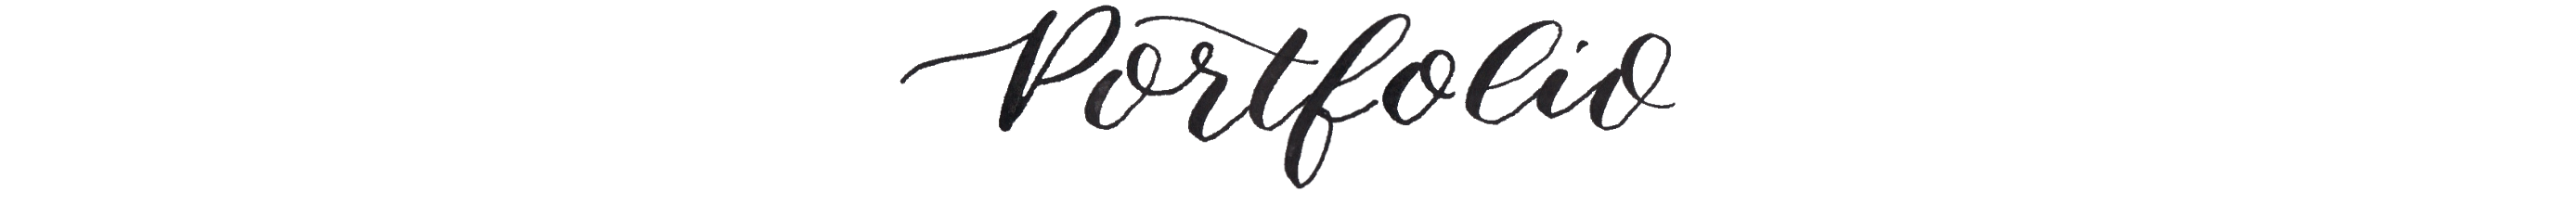 portfolio - inkanotes Calligraphy Watercolor Artist Food & Flower and Botanical Illustrations Designer Illustrator Germany Ecofriendly & Substaniability